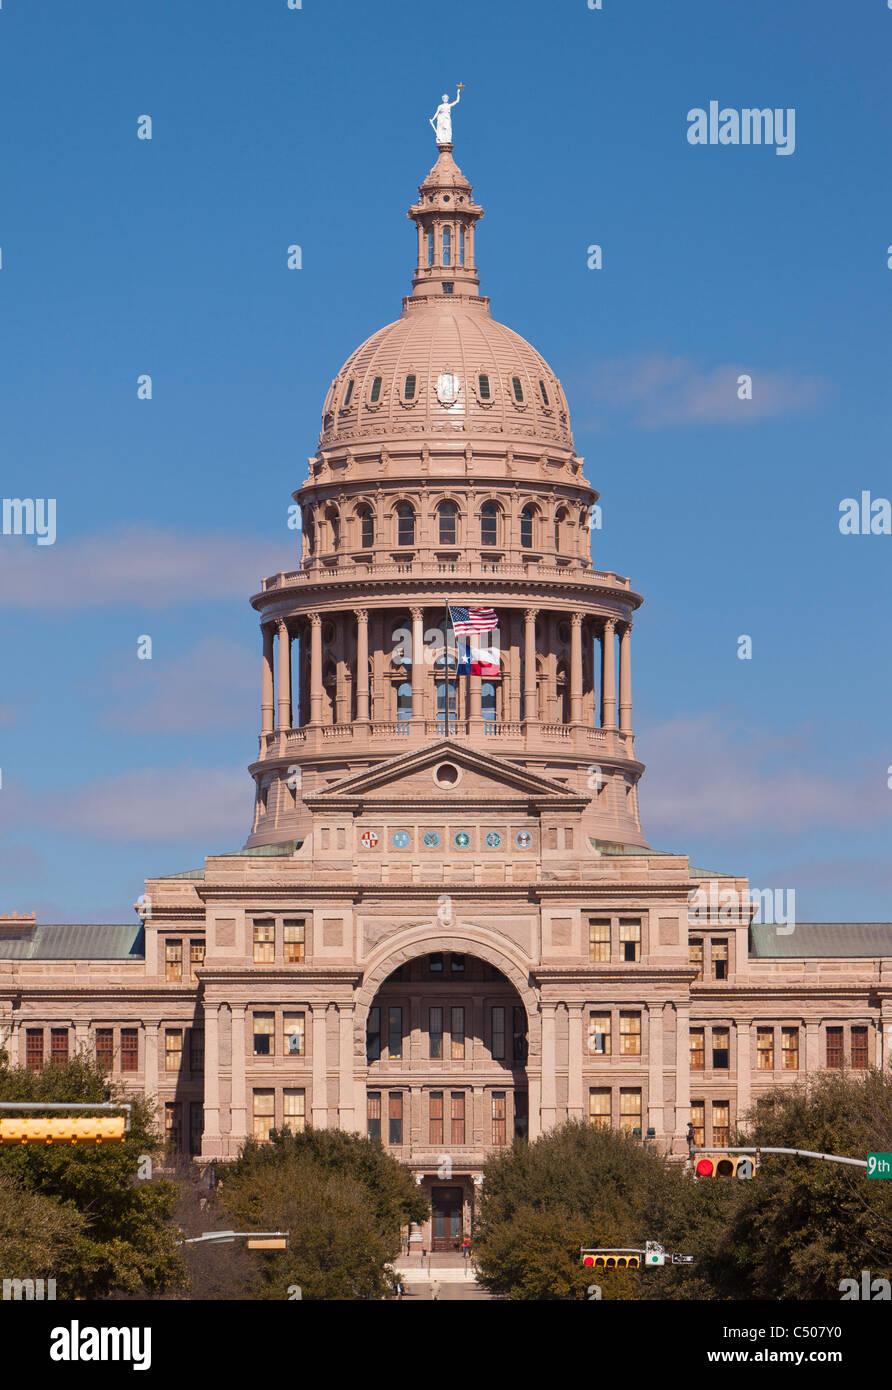 AUSTIN, TEXAS, USA - Texas State Capitol building. Stock Photo